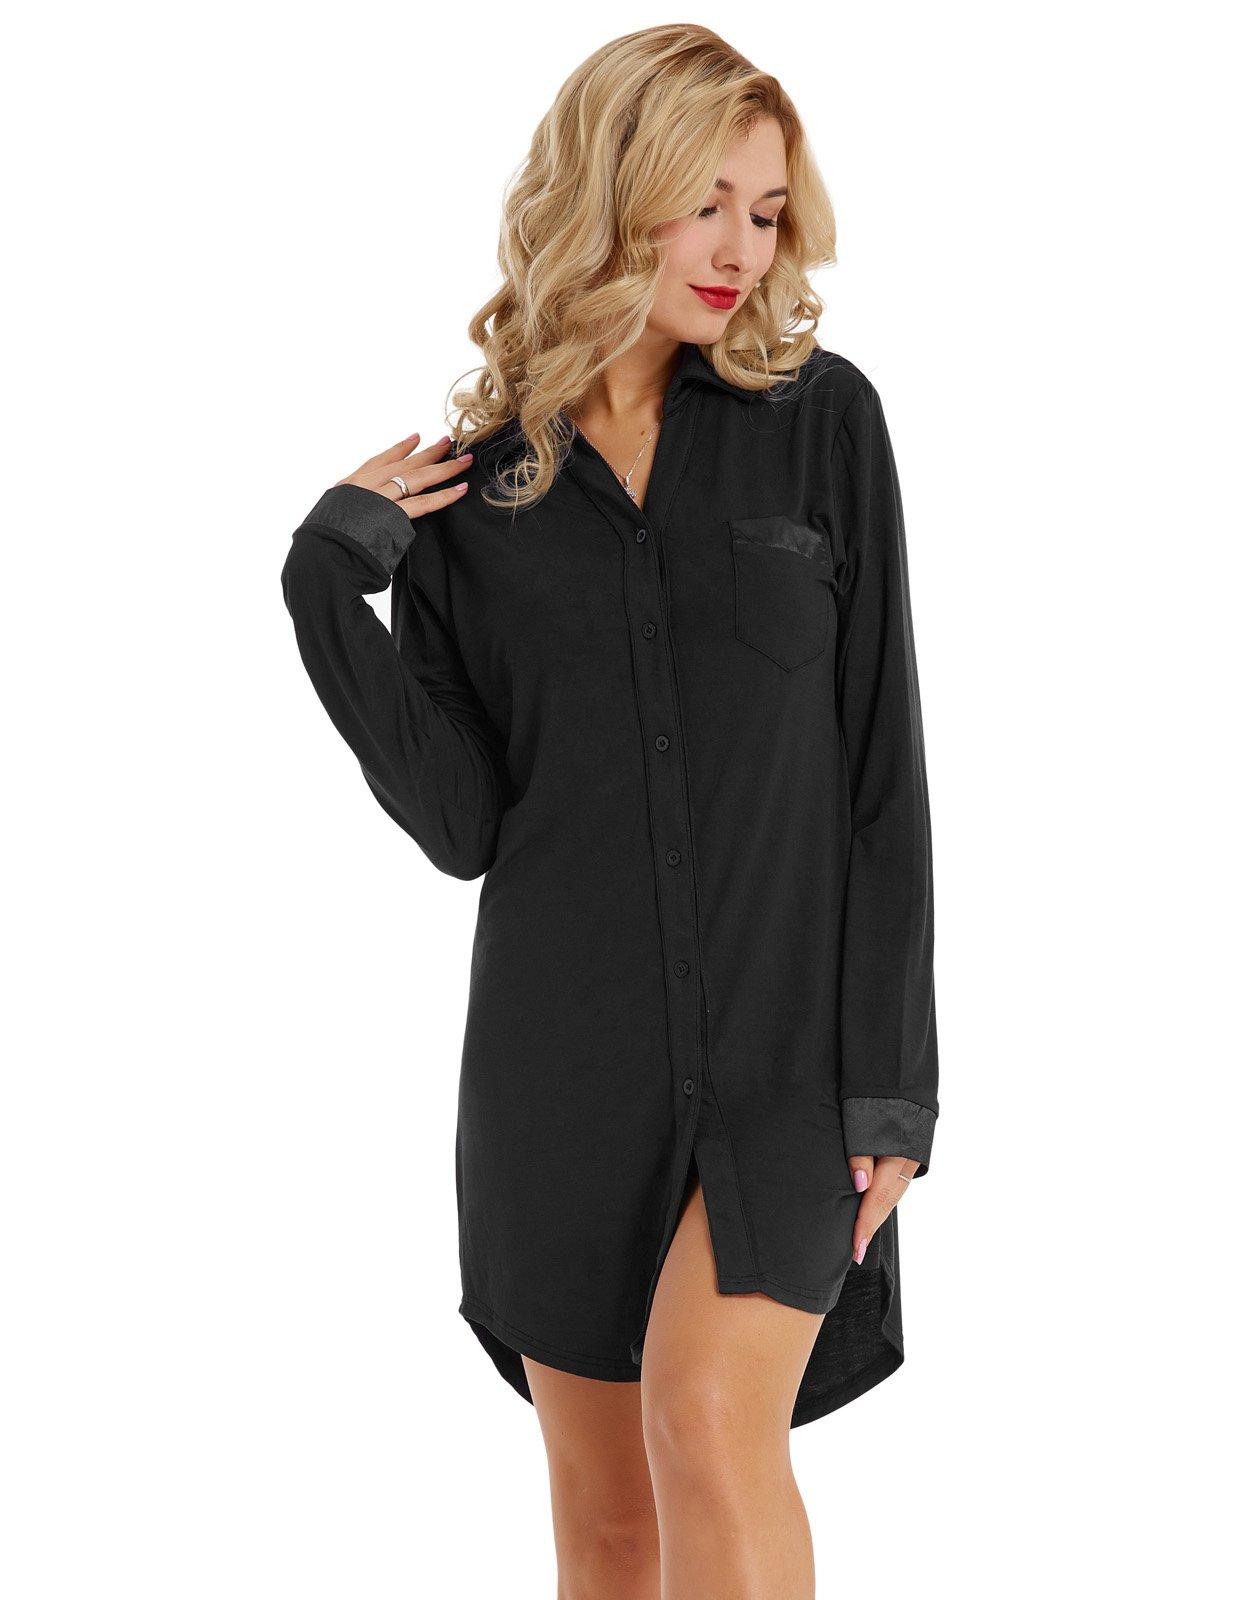 Zexxxy Women Modal Stretchy Nightgown Top Knee Length Boyfirend Style Black L